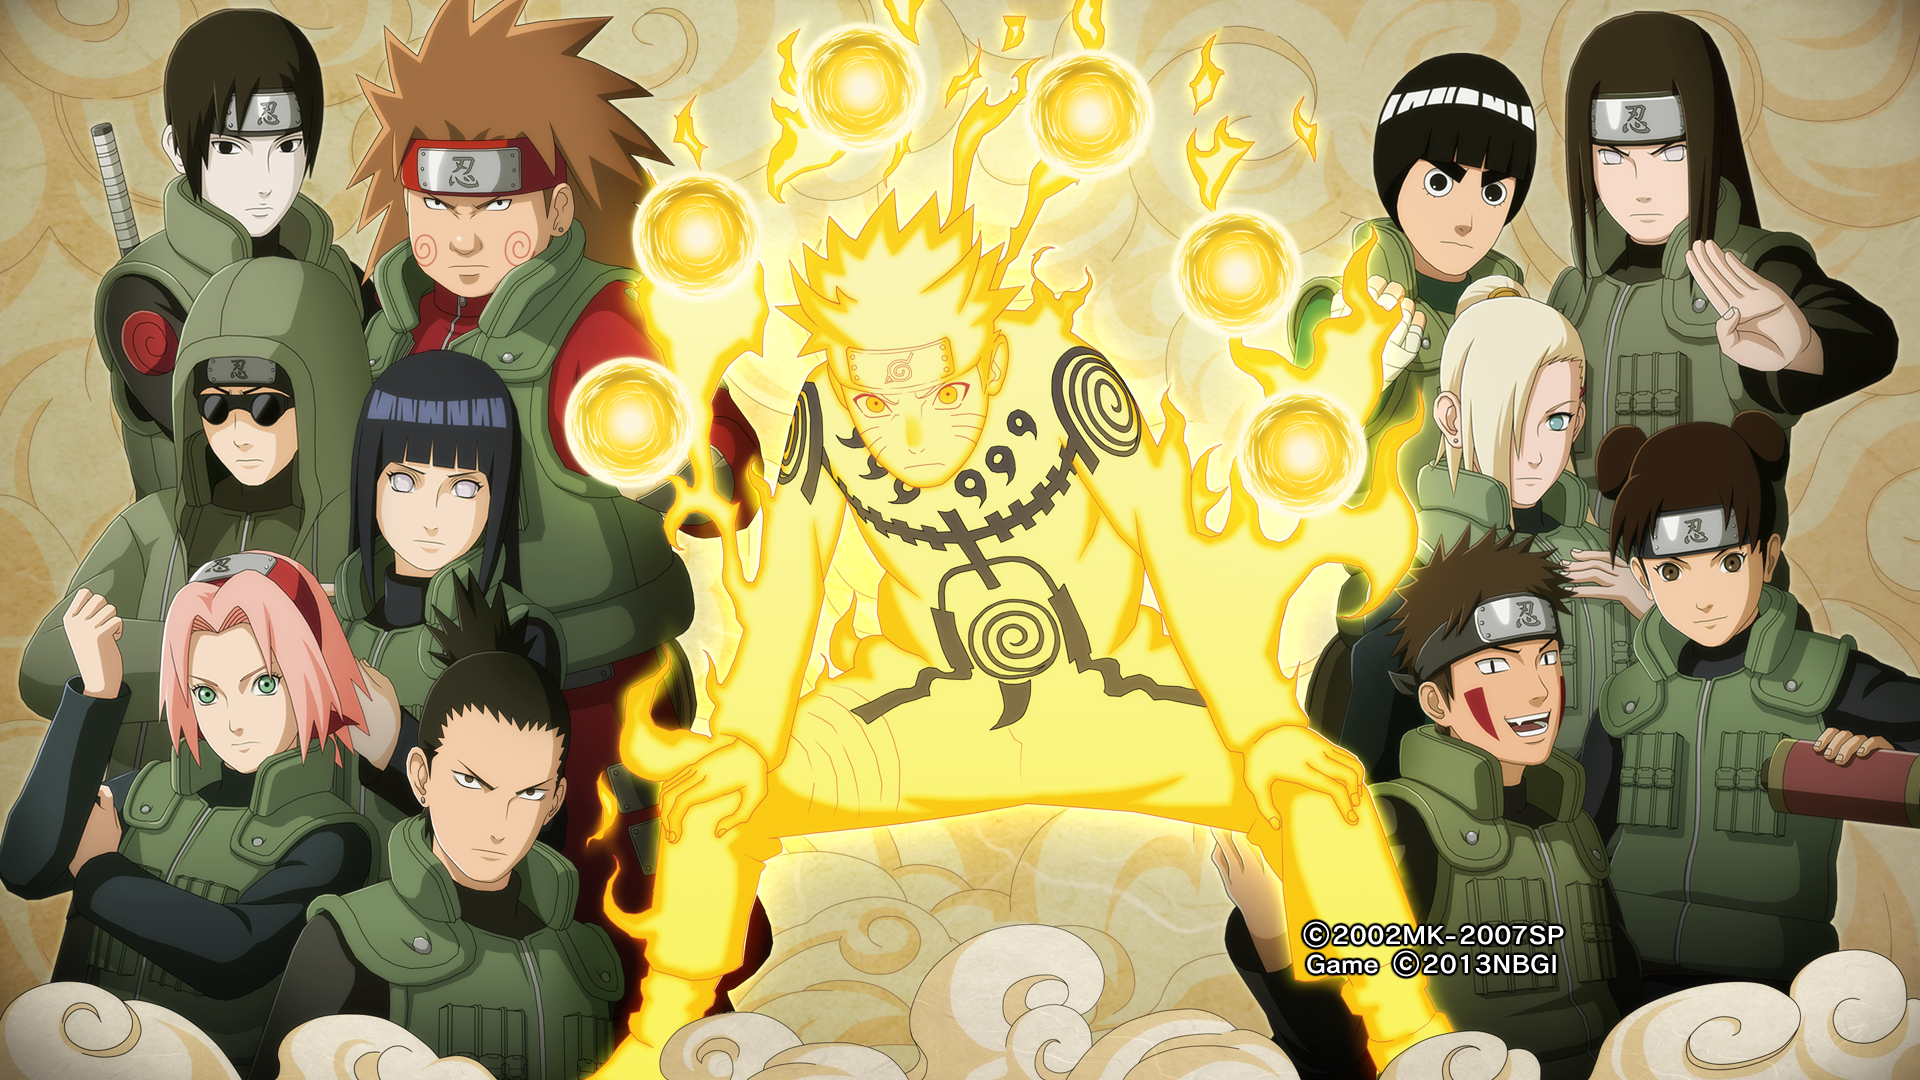 Download Wallpaper Naruto Art - naruto_wallpaper_by_zerogravity411-d7f2jst  Pic_932773.jpg